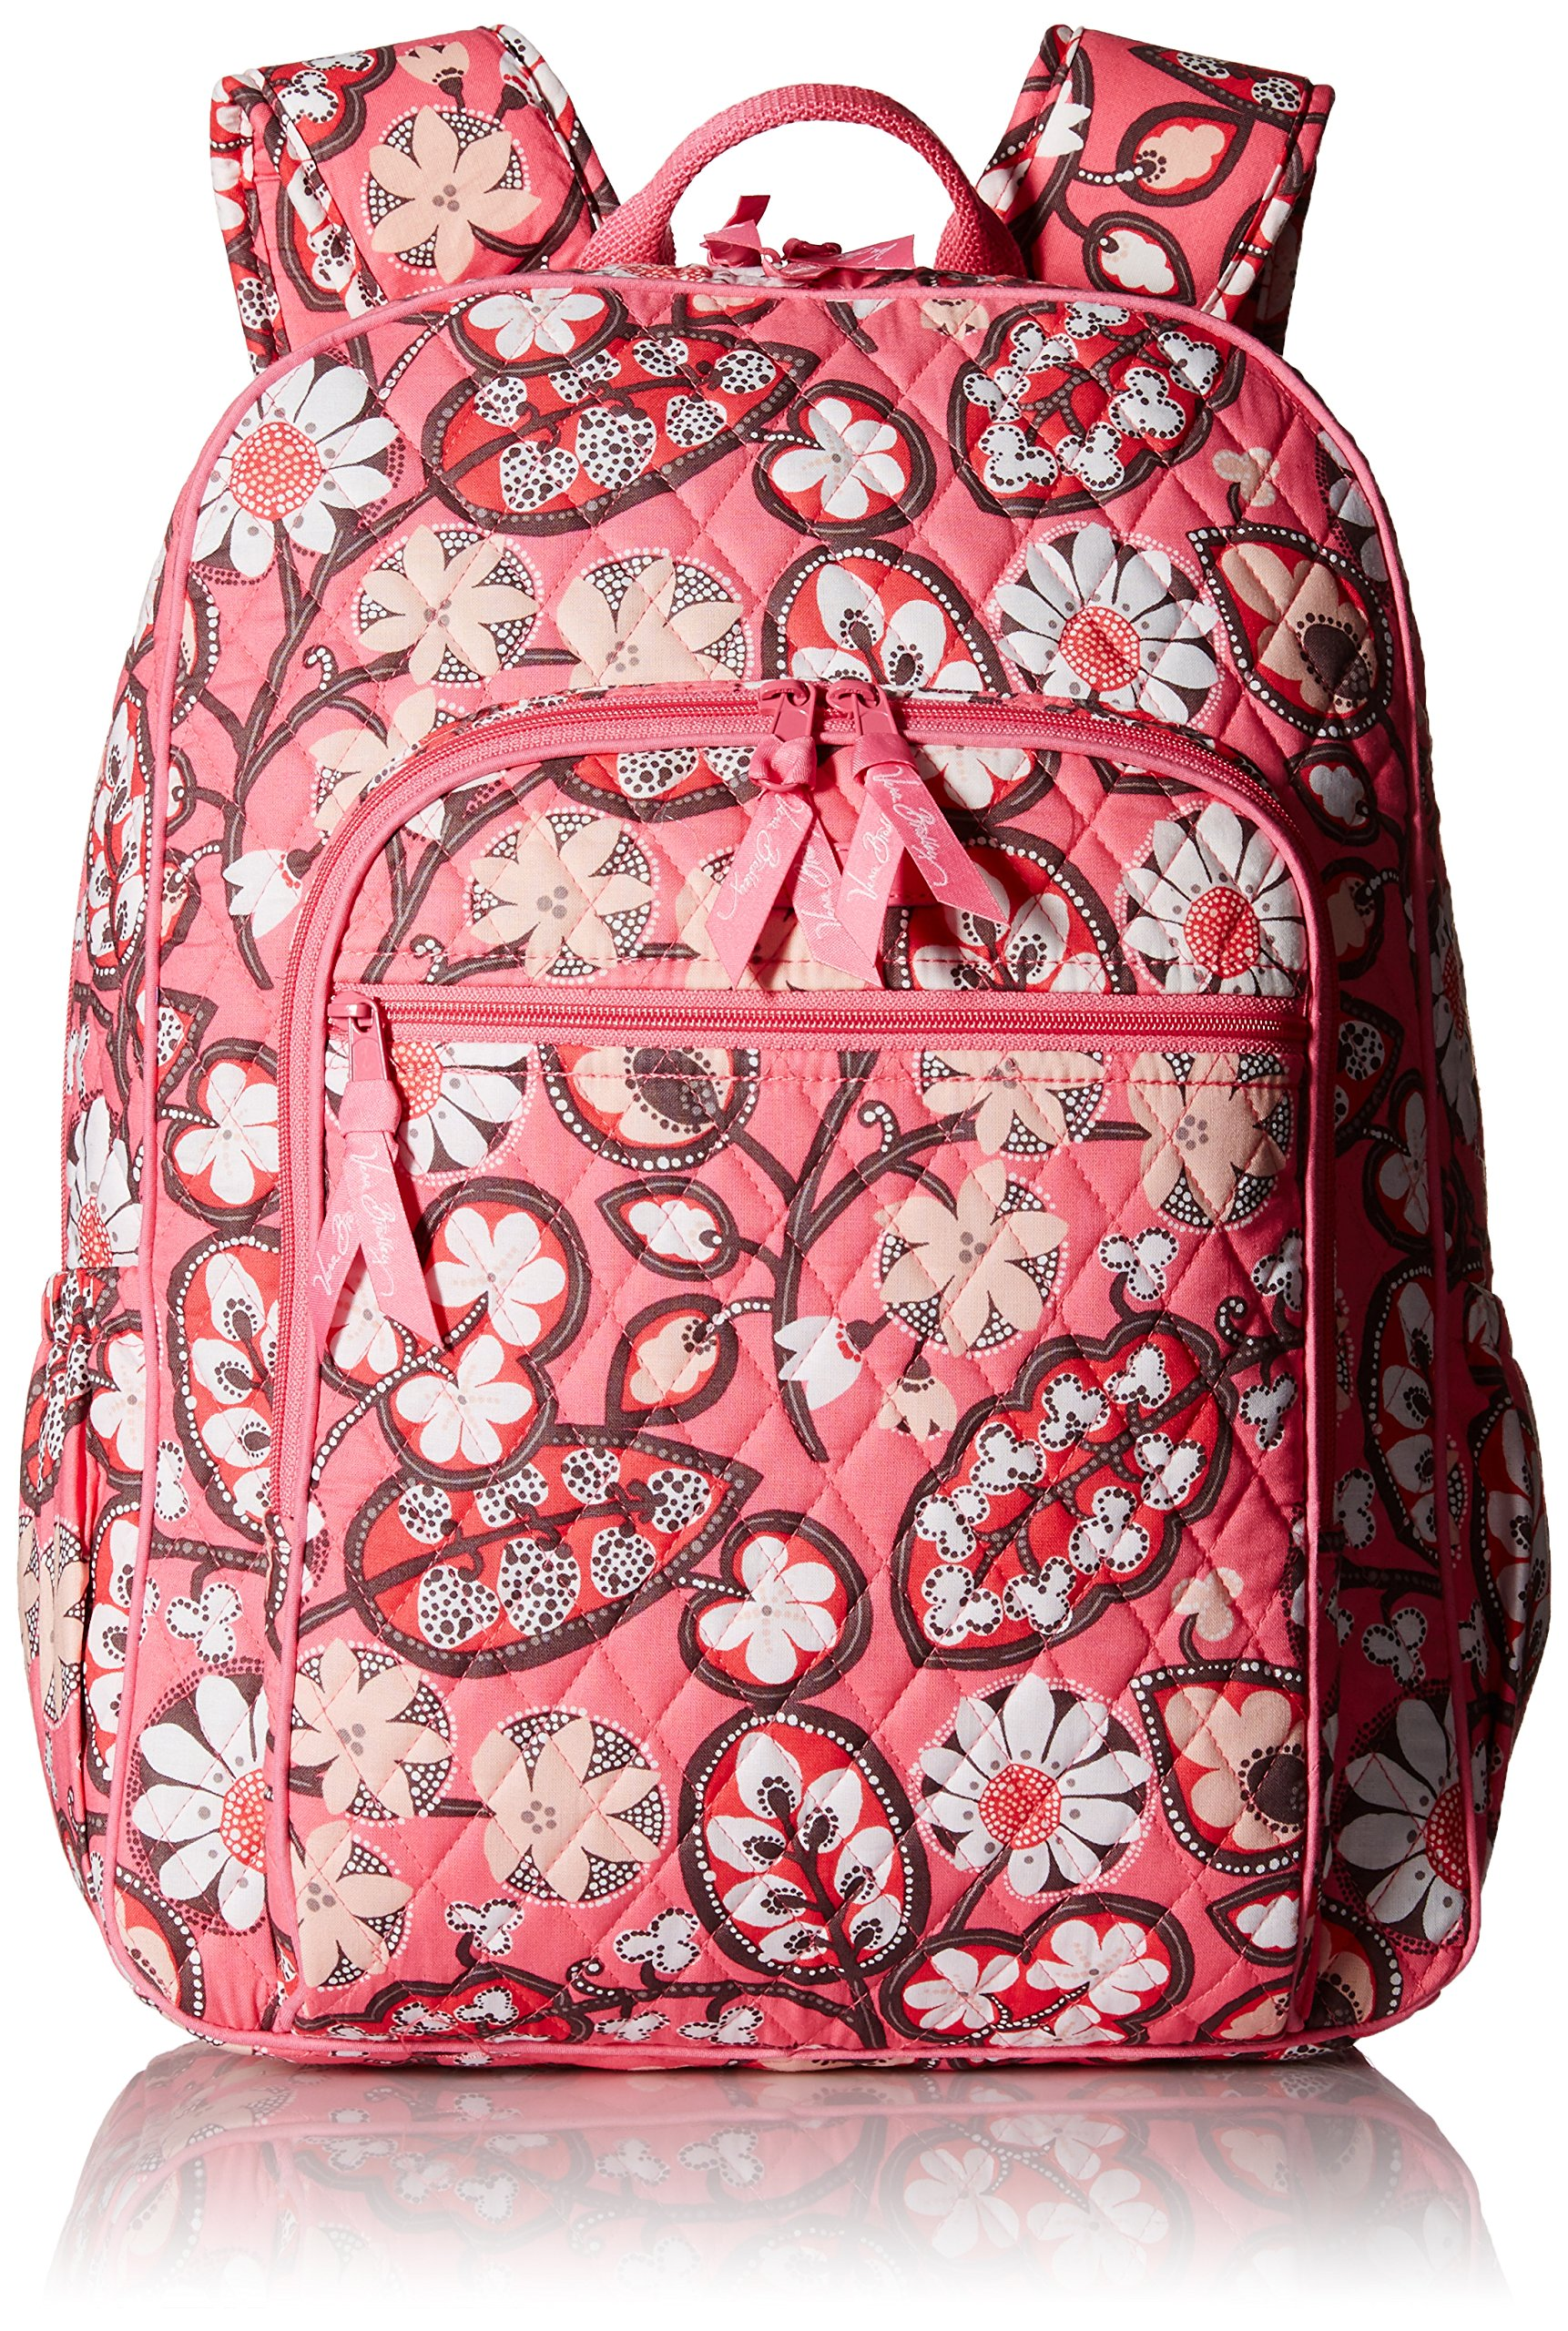 Women's Campus Tech Backpack, Signature Cotton, Blush Pink